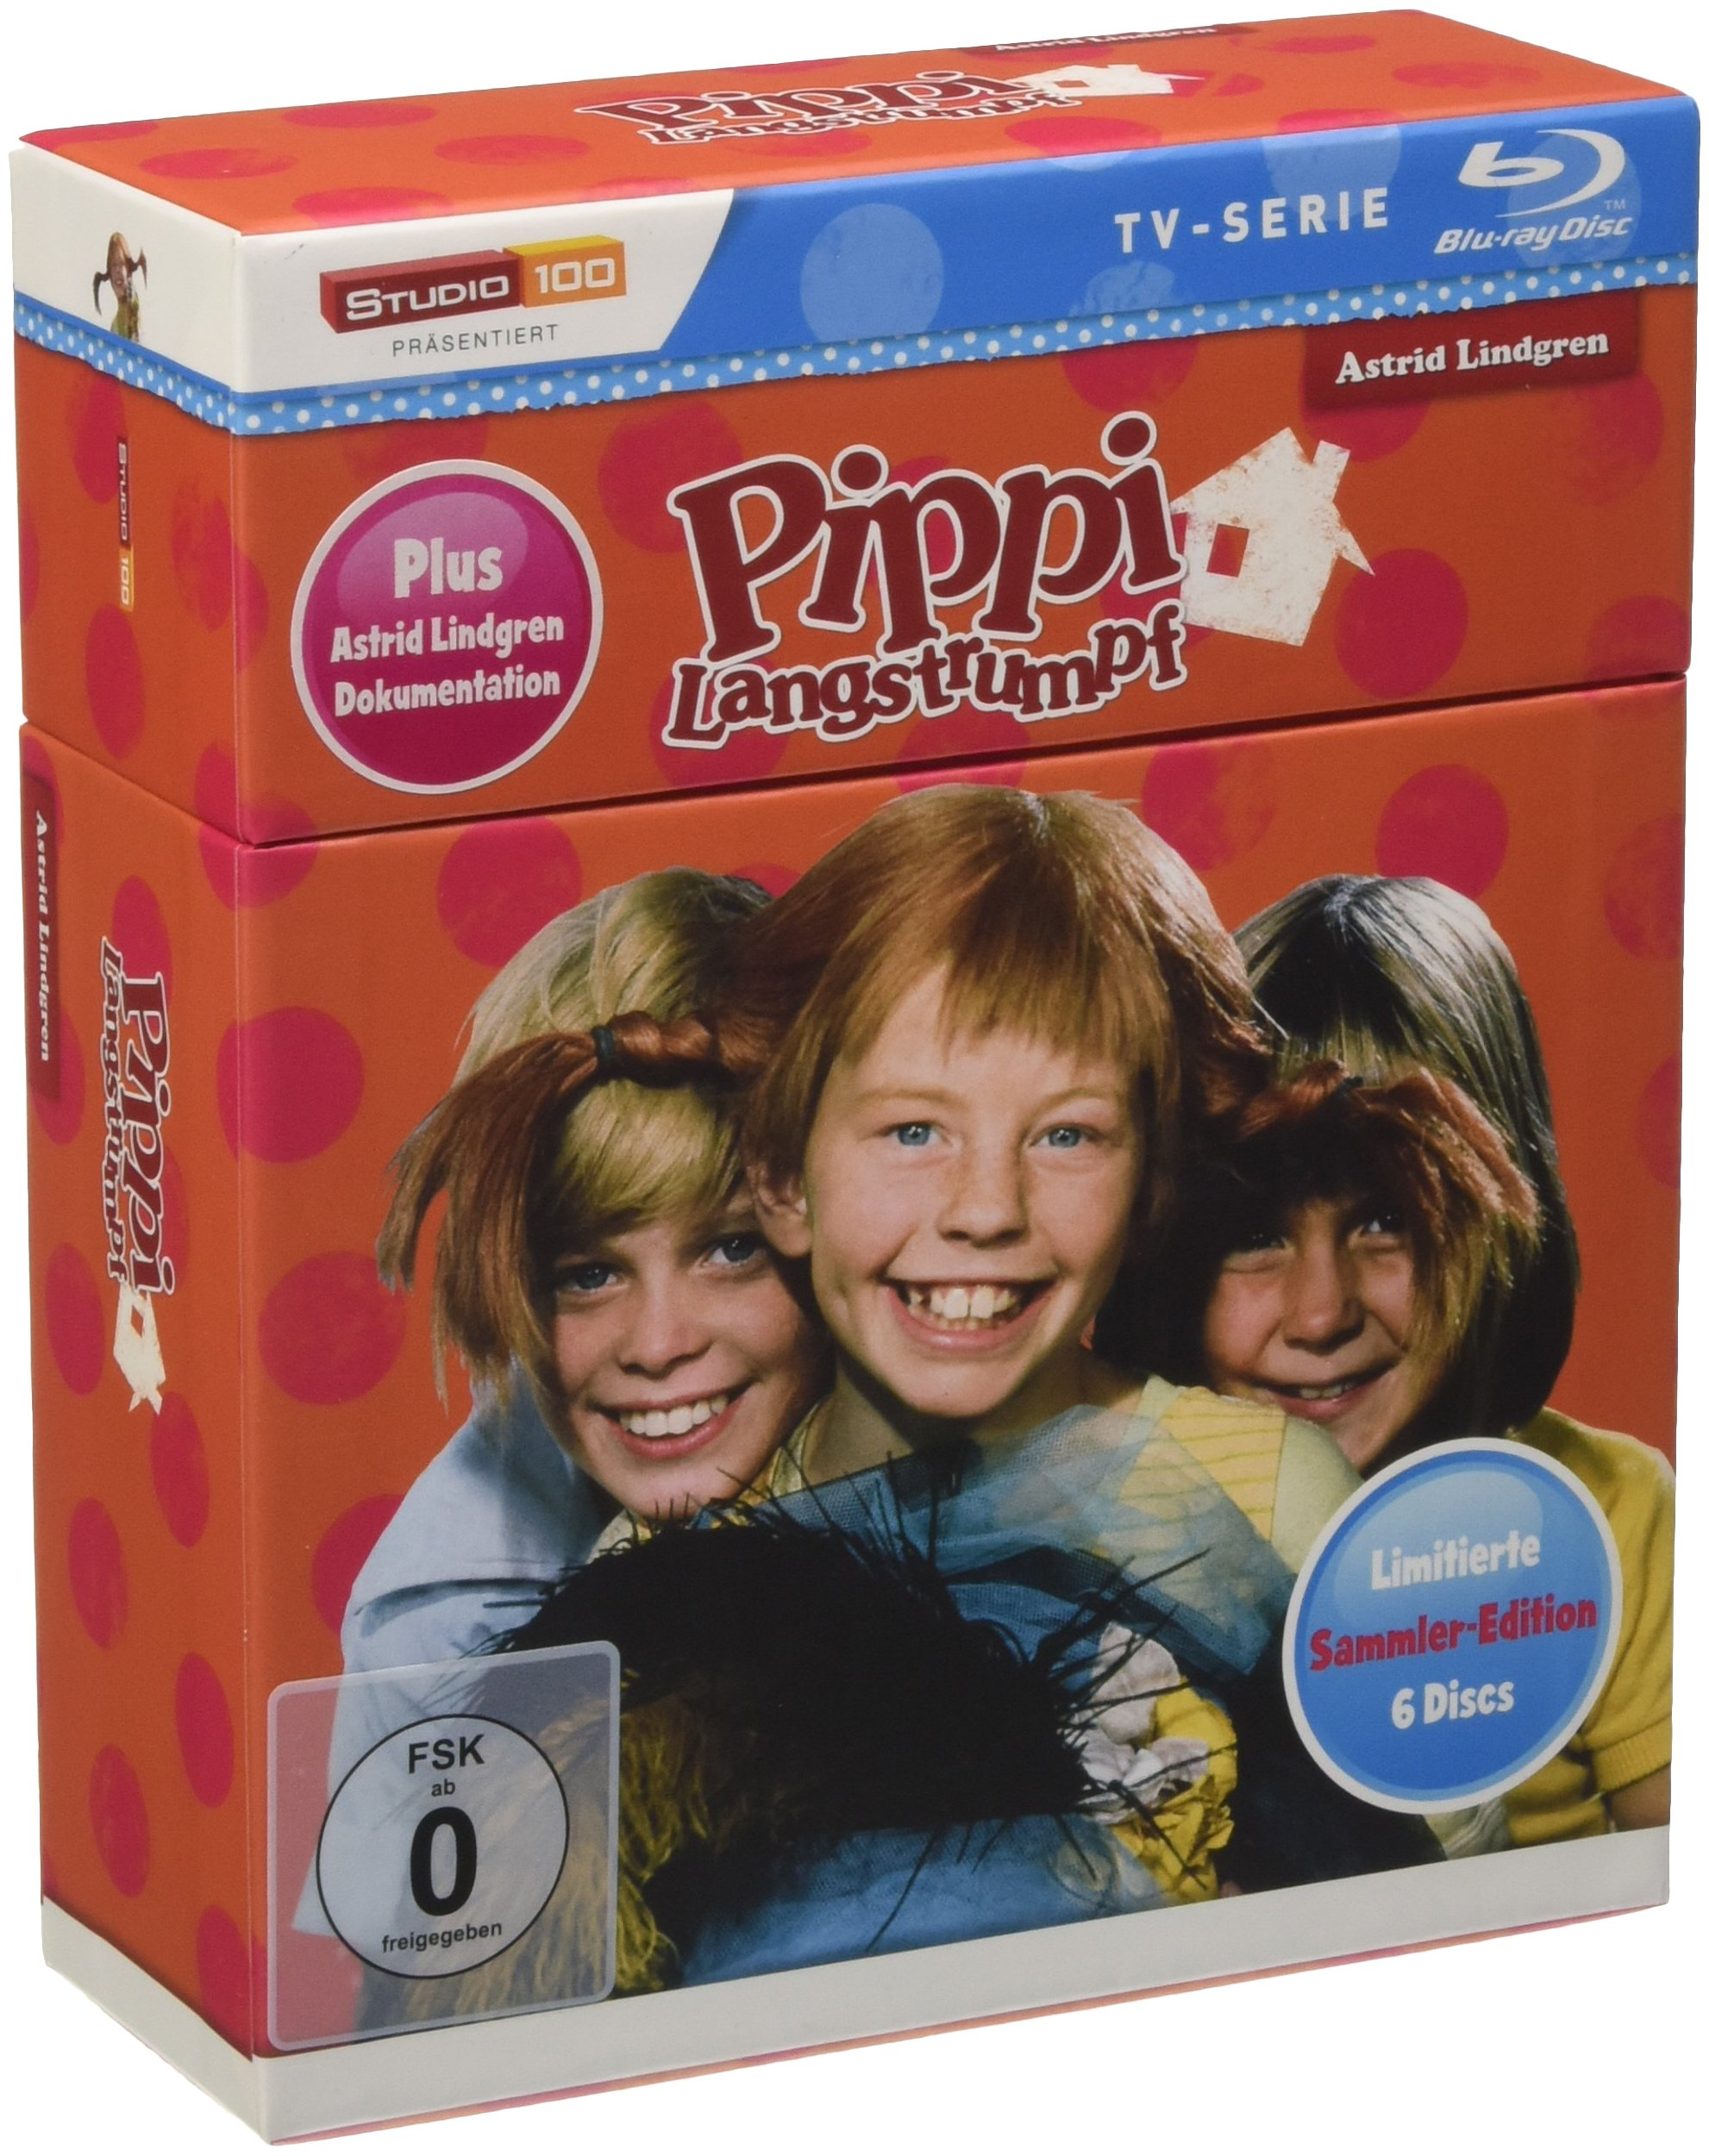 Pippi Langstrumpf TV-Serie Box by